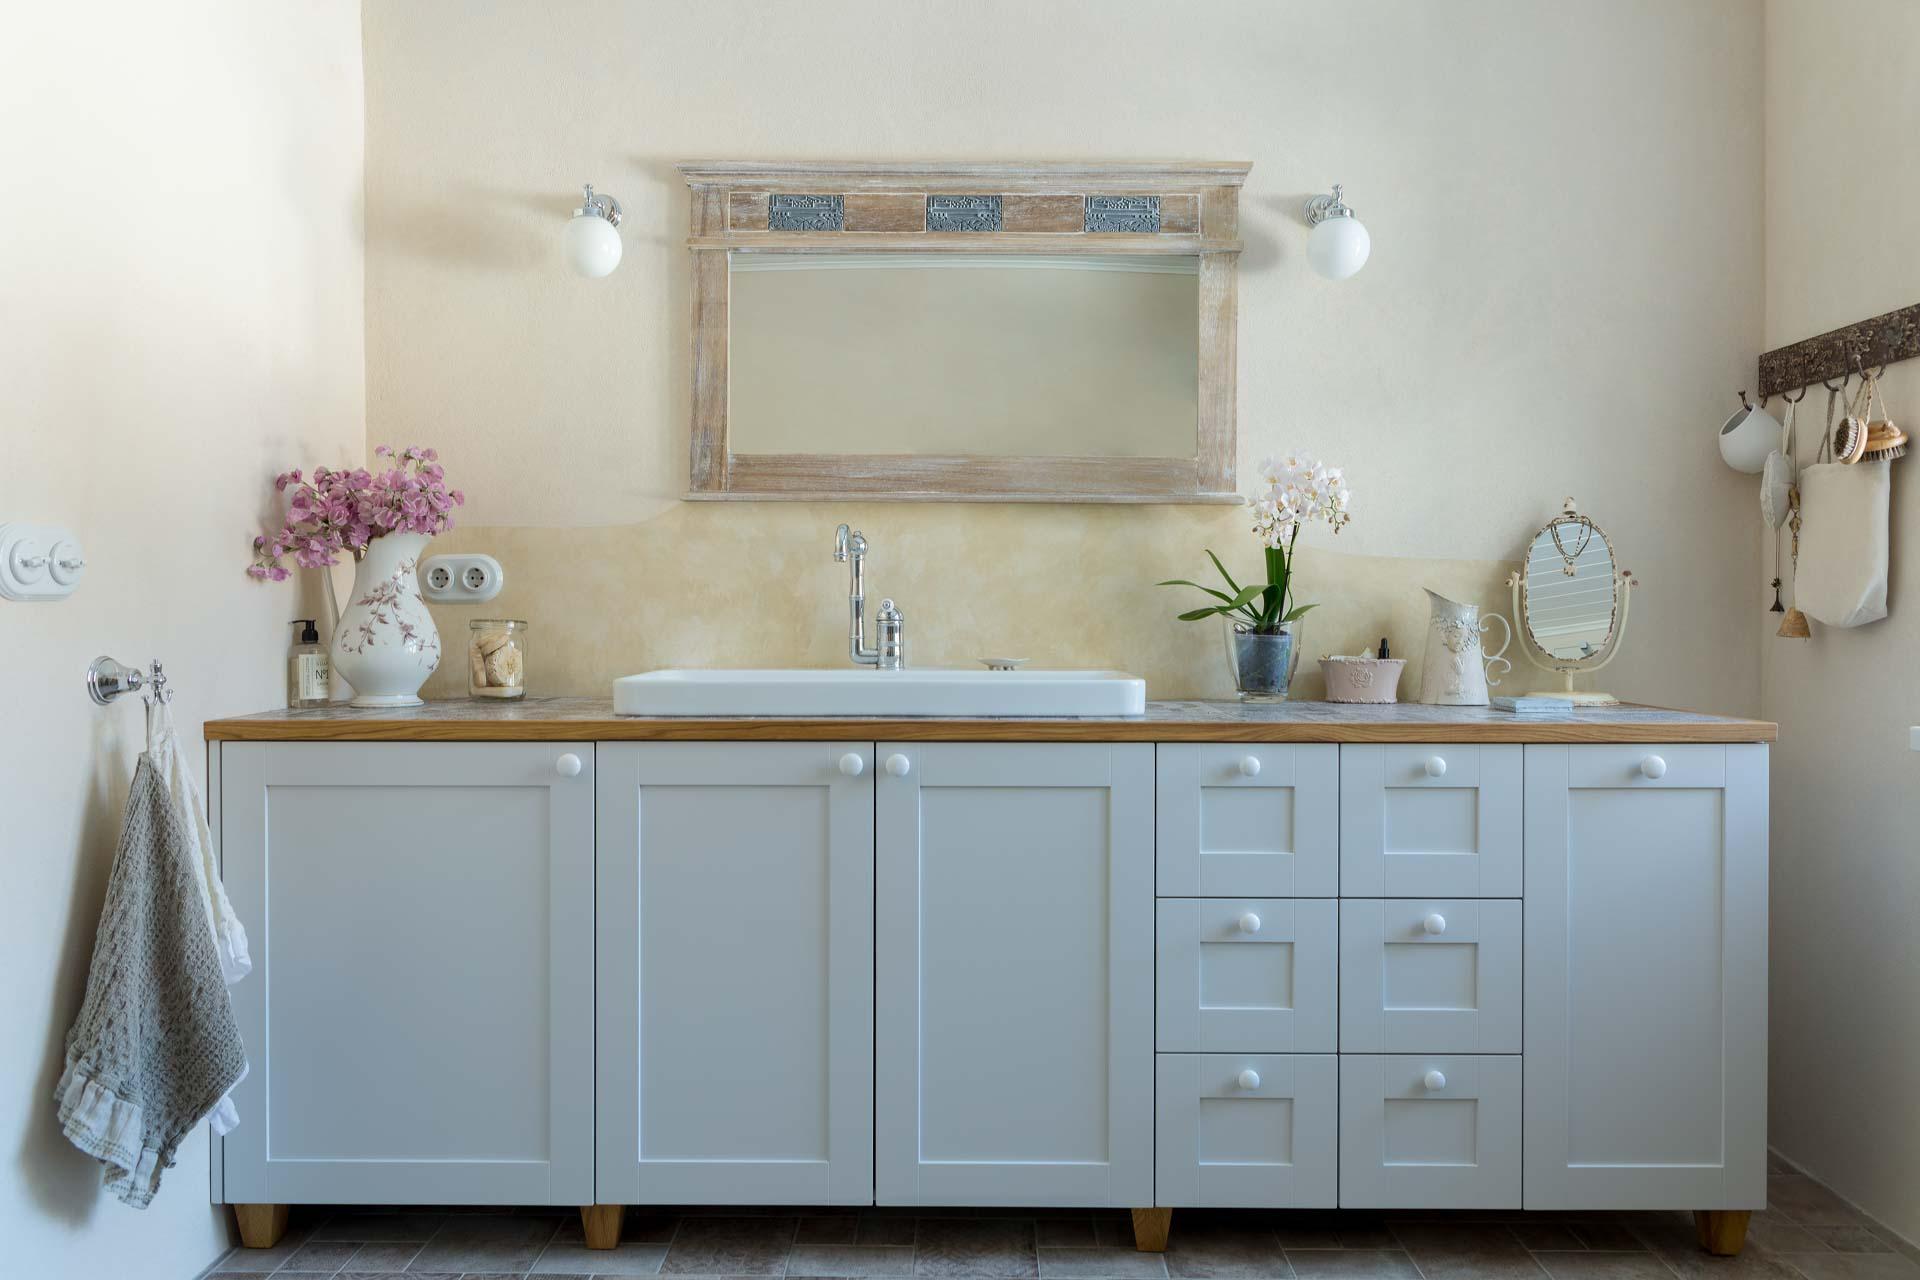 Custom made furniture for the bathroom